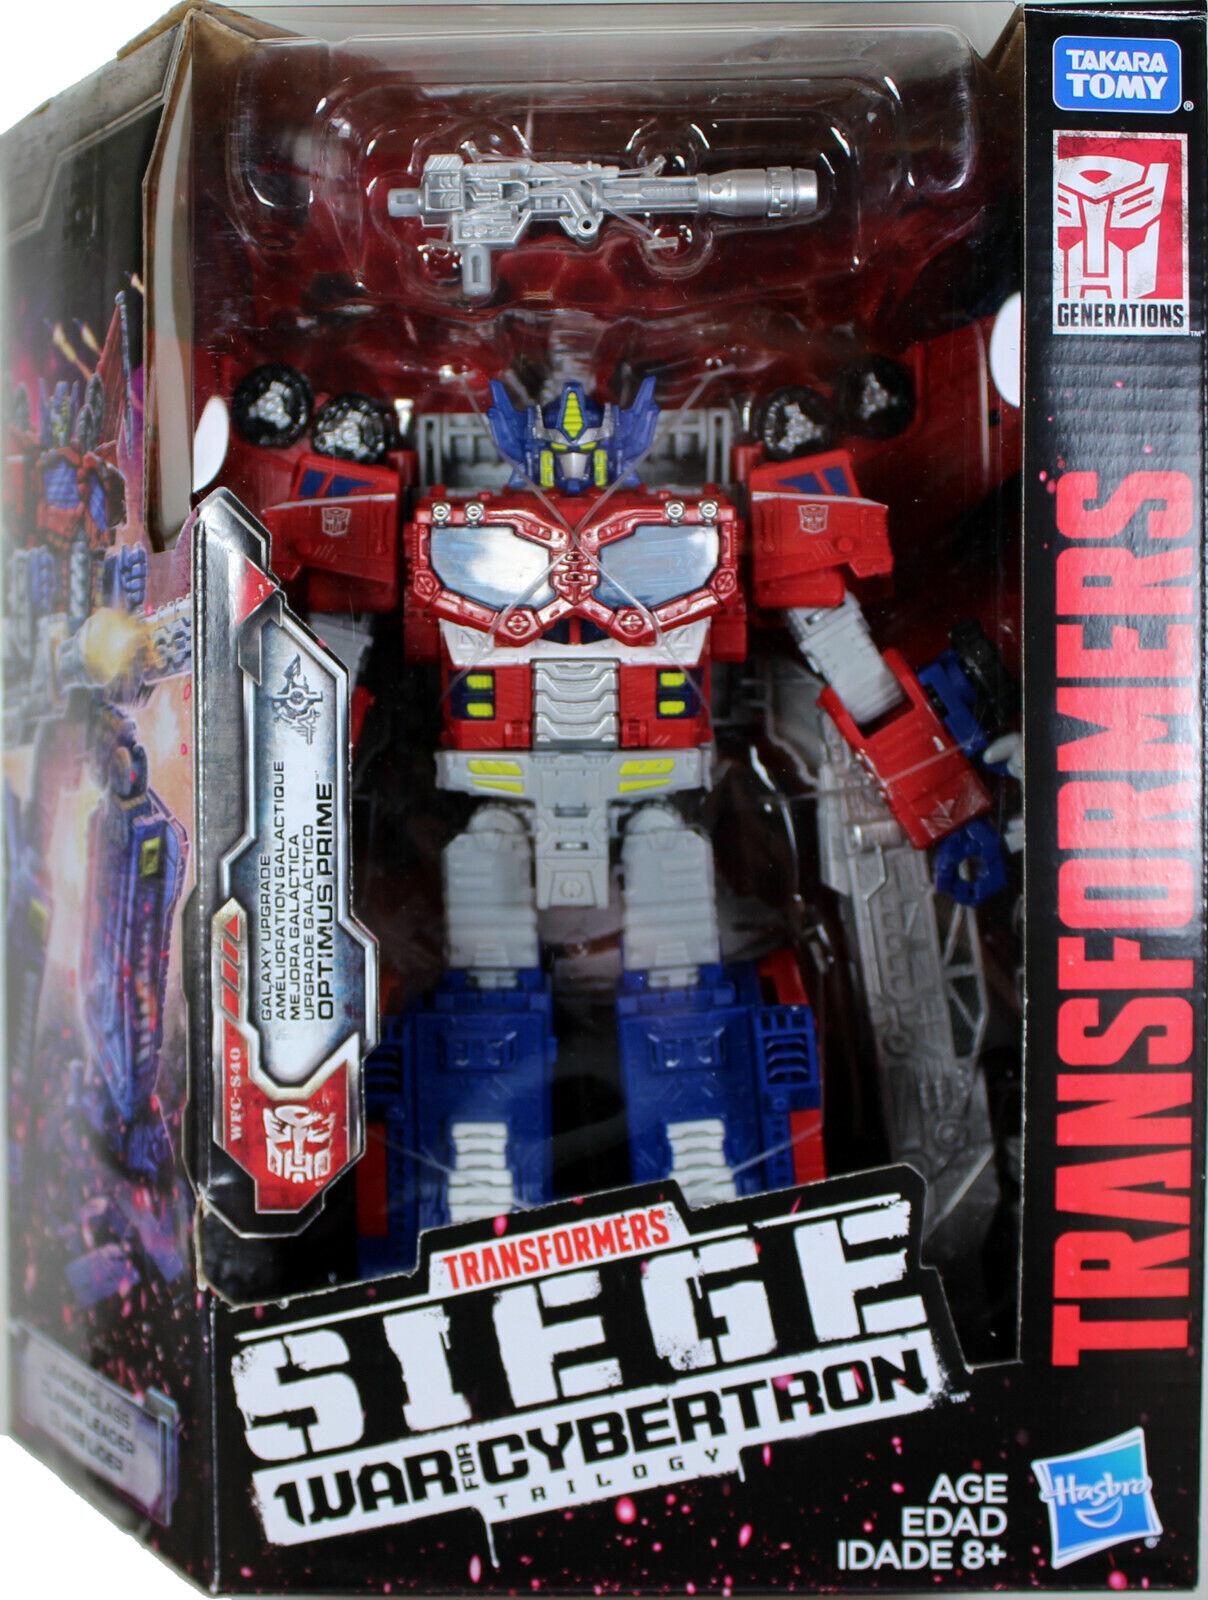 Transformers Optimus Prime Figura de acción líder   asedio  guerra por Cybertron